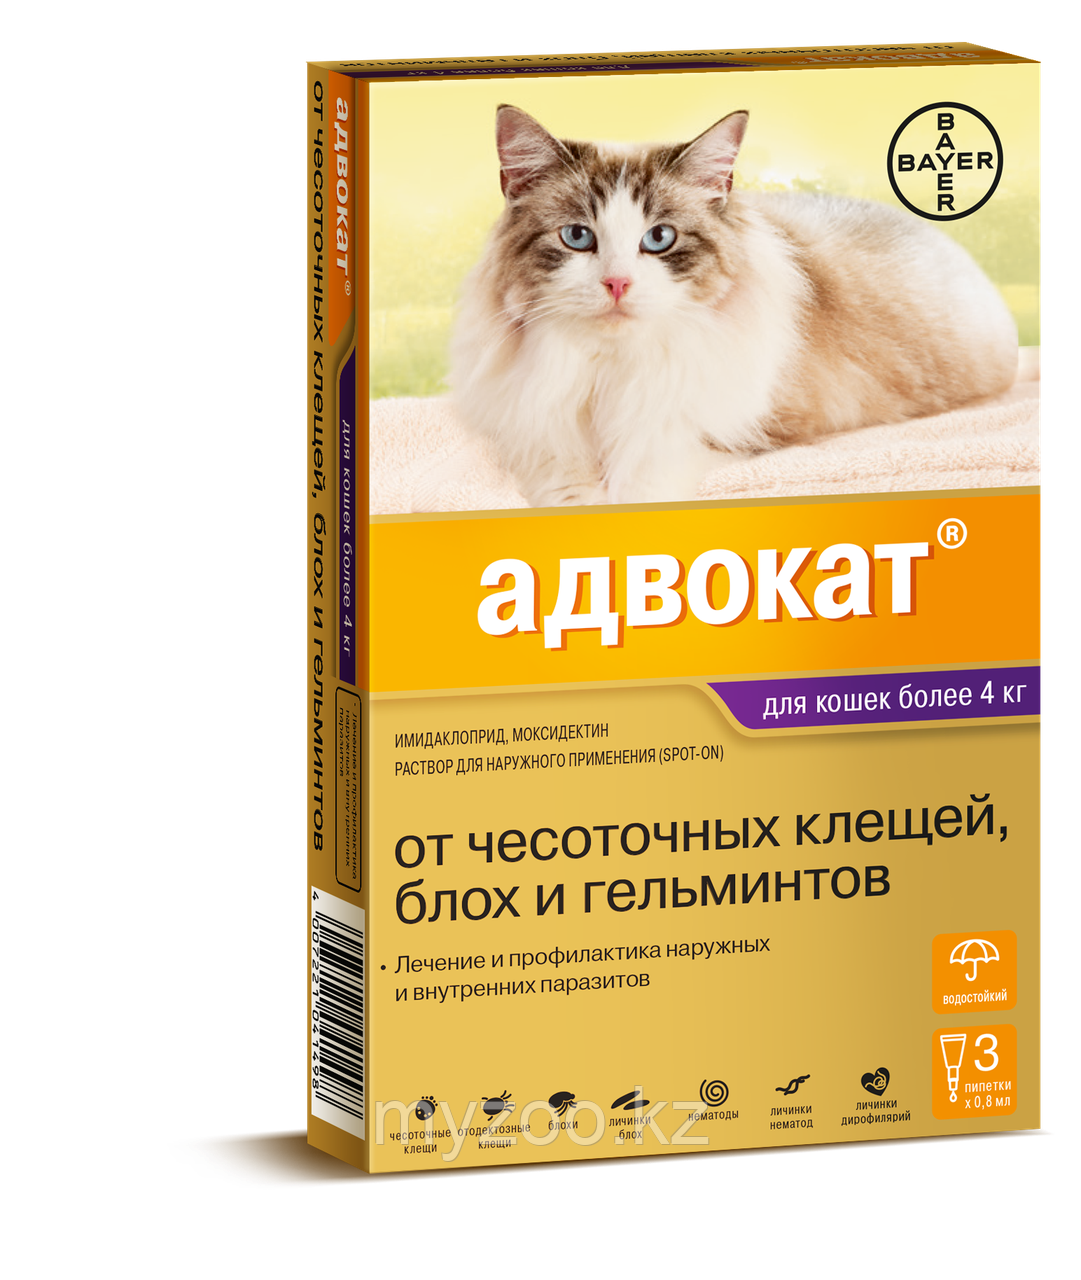 Адвокат д/кошек массой от 4 до 8 кг 0,8 мл,1 пипетка